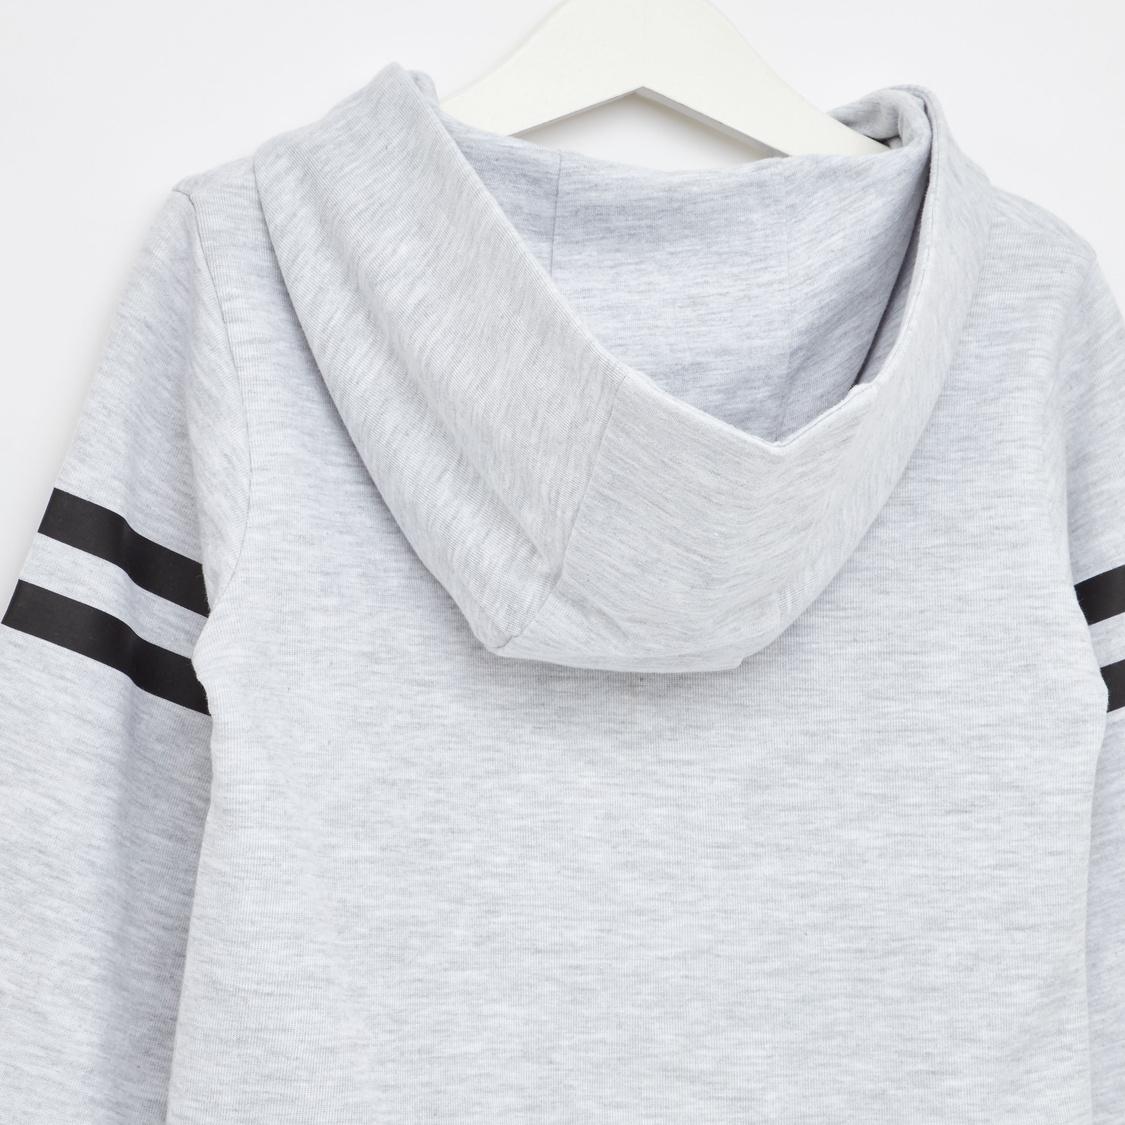 Sequin Embellished Printed Sweatshirt with Long Sleeves and Hood